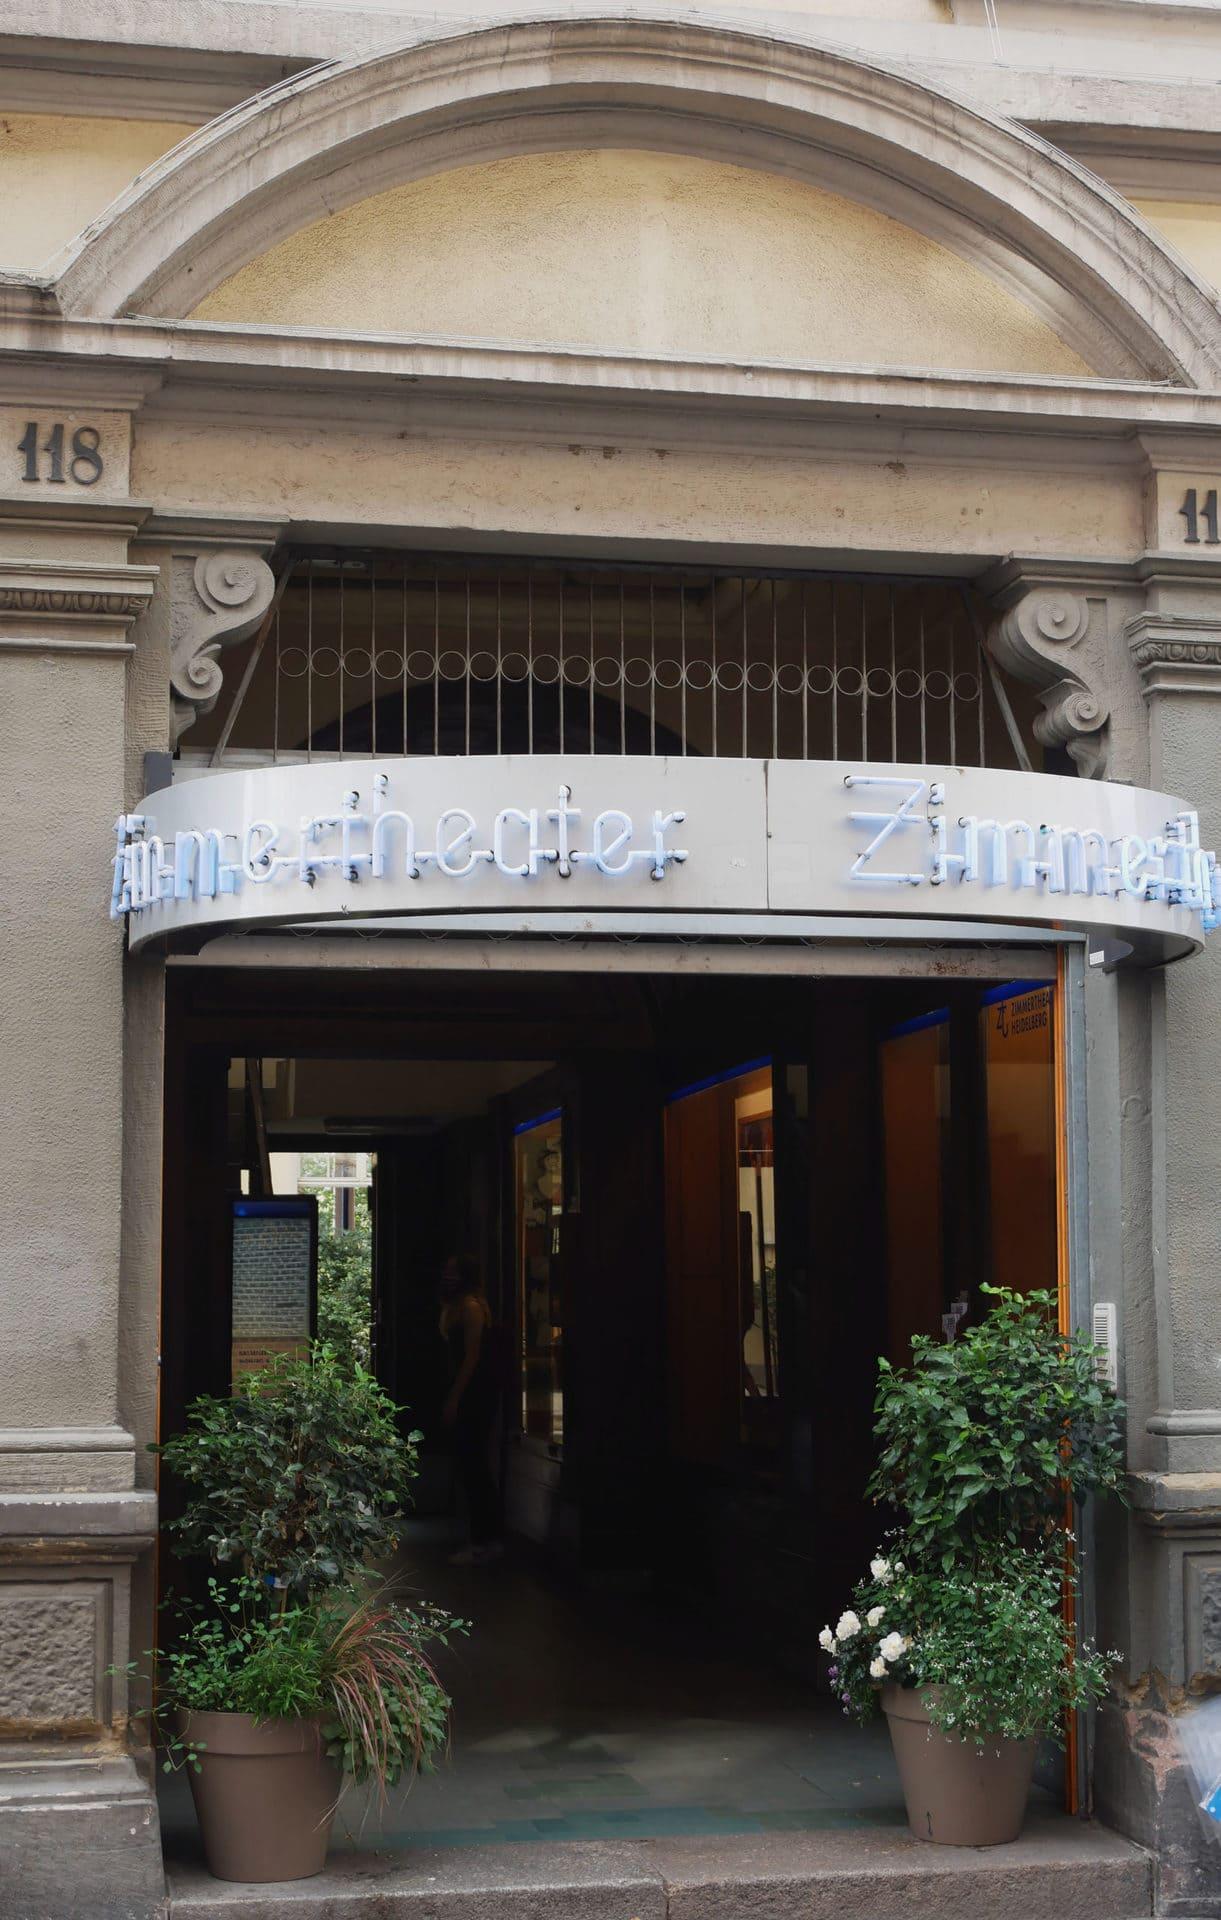 Eingang zum Zimmertheater